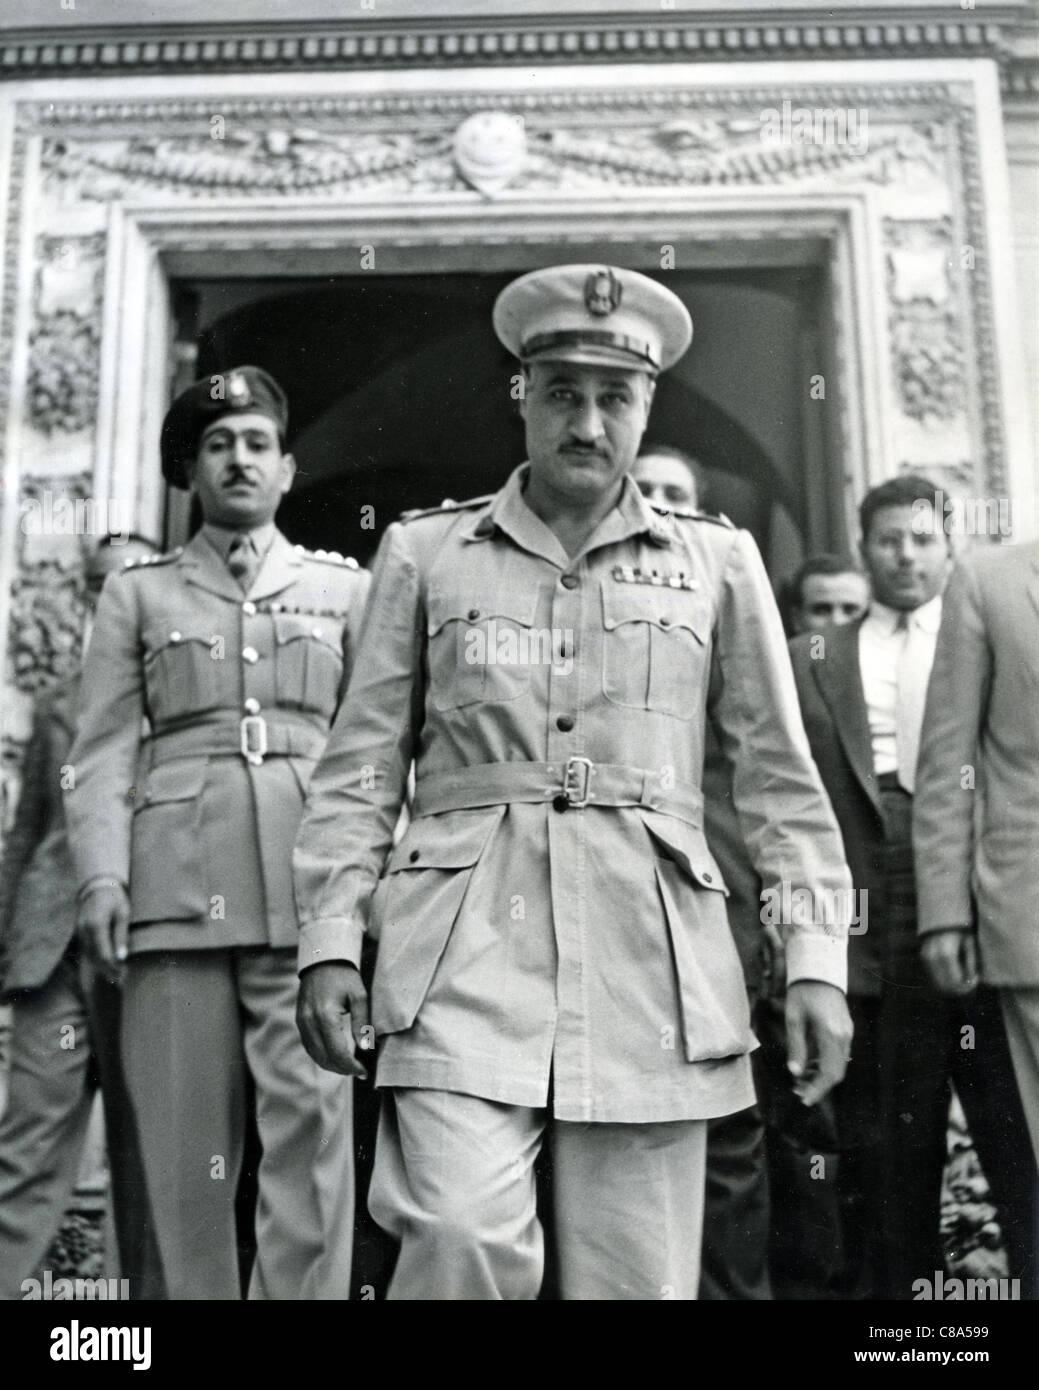 GAMAL ABDEL NASSER (1918-1970) second President of Egypt about 1952 - Stock Image